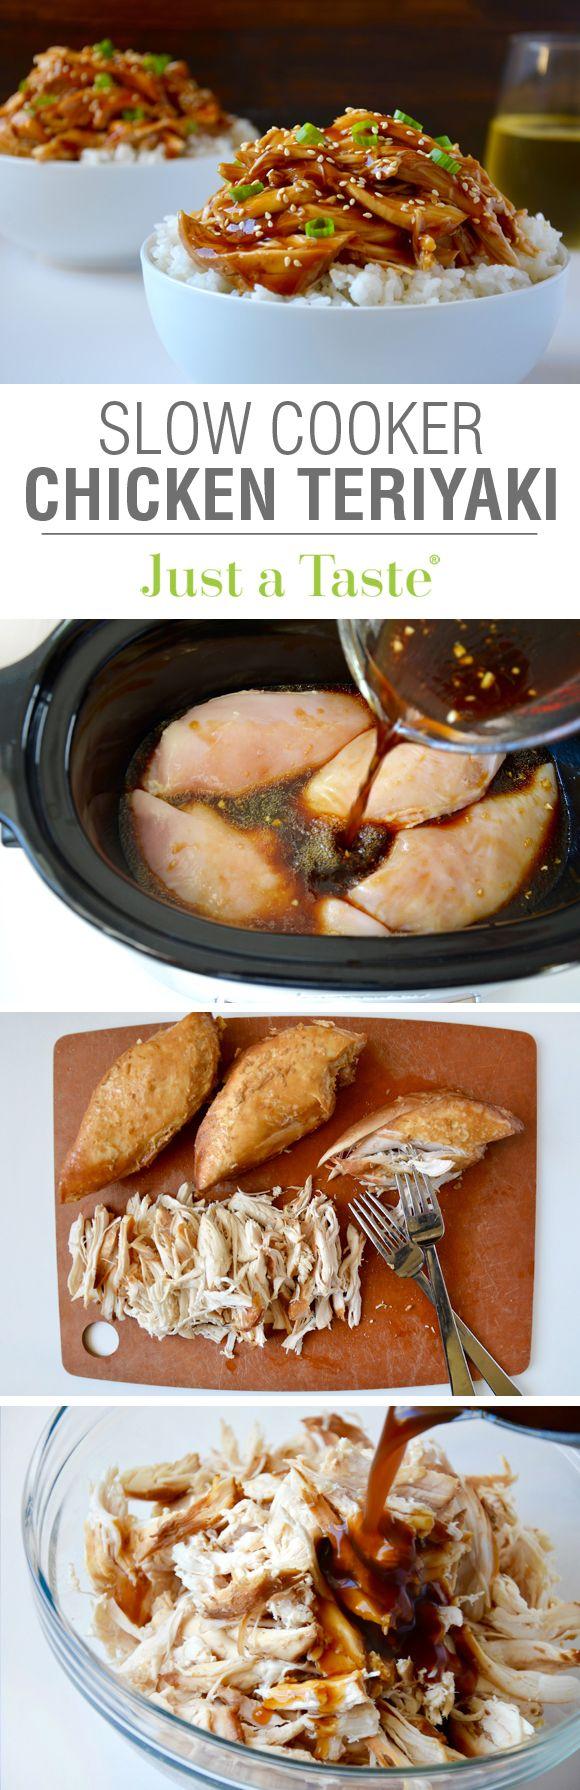 Slow Cooker Pulled Chicken Teriyaki Recipe via justataste.com   The ultimate easy dinner recipe!